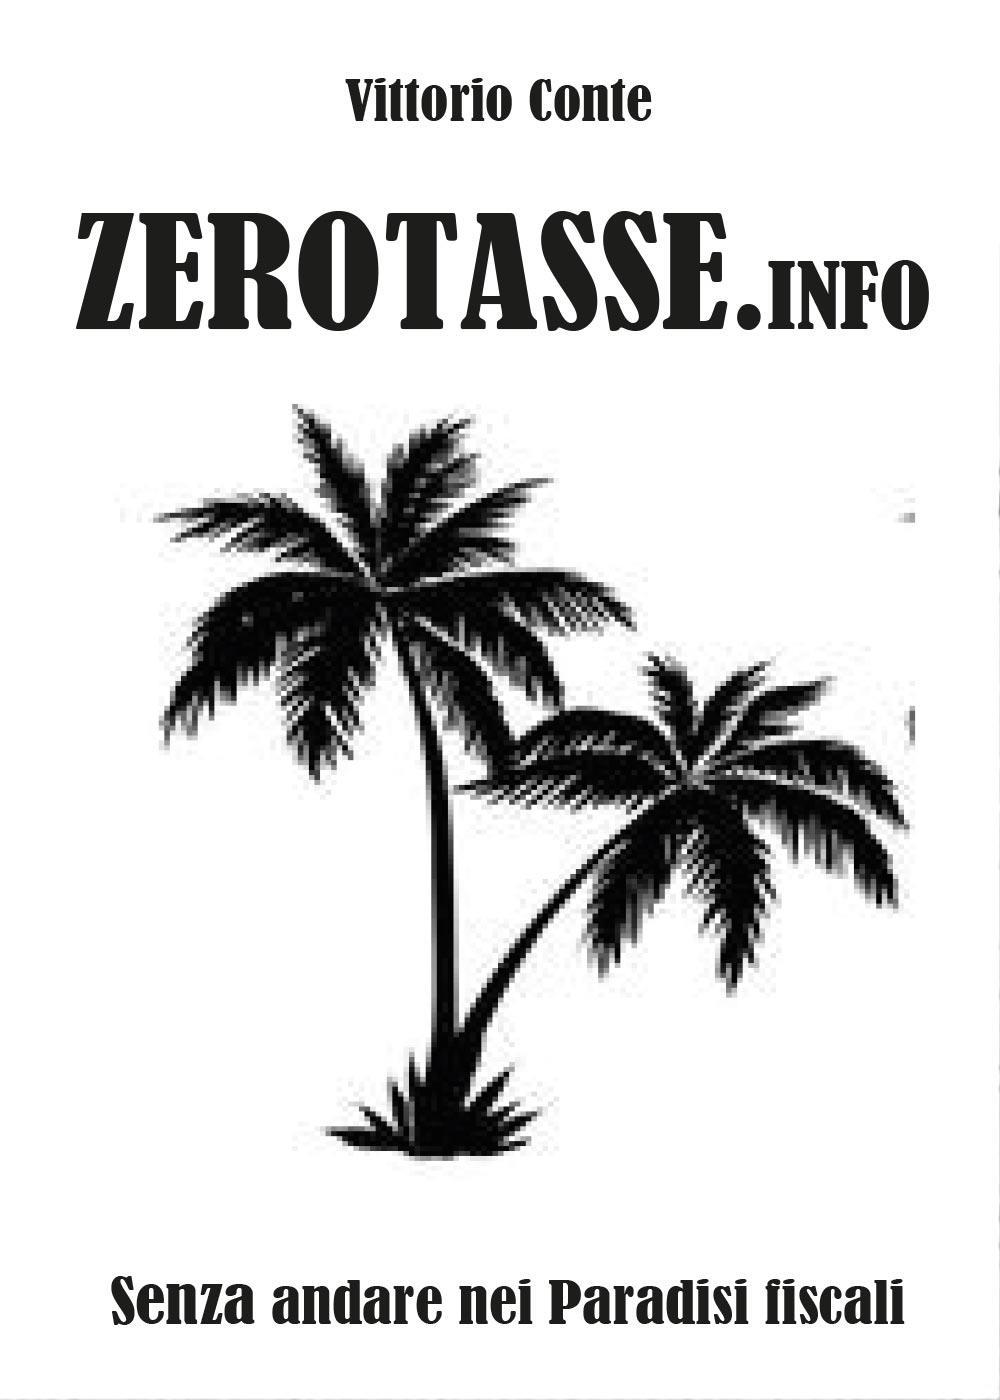 Zerotasse.info - senza andare nei paradisi fiscali